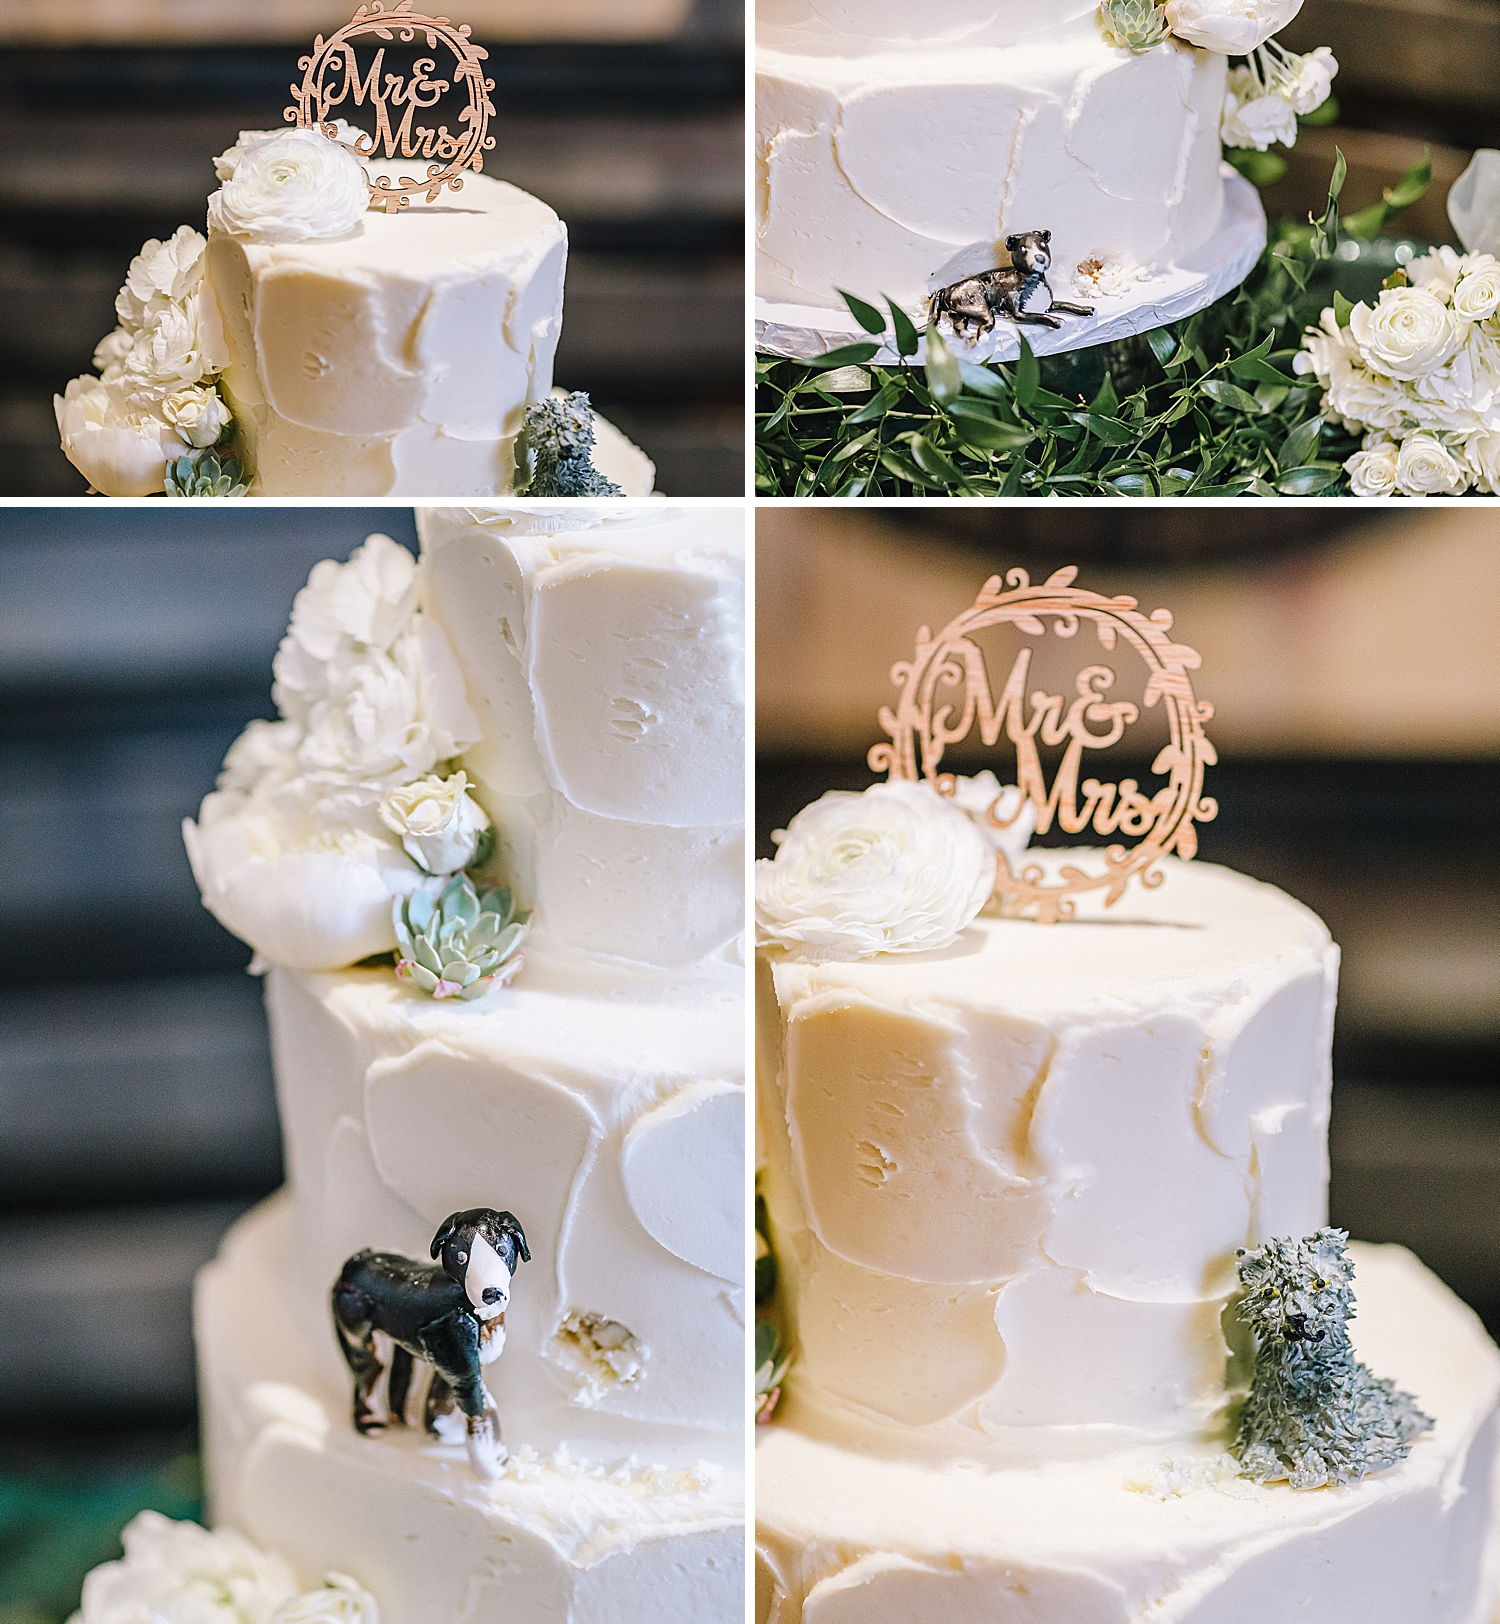 Magnolia-Halle-Wedding-San-Antonio-Texas-Bride-Grom_0008.jpg